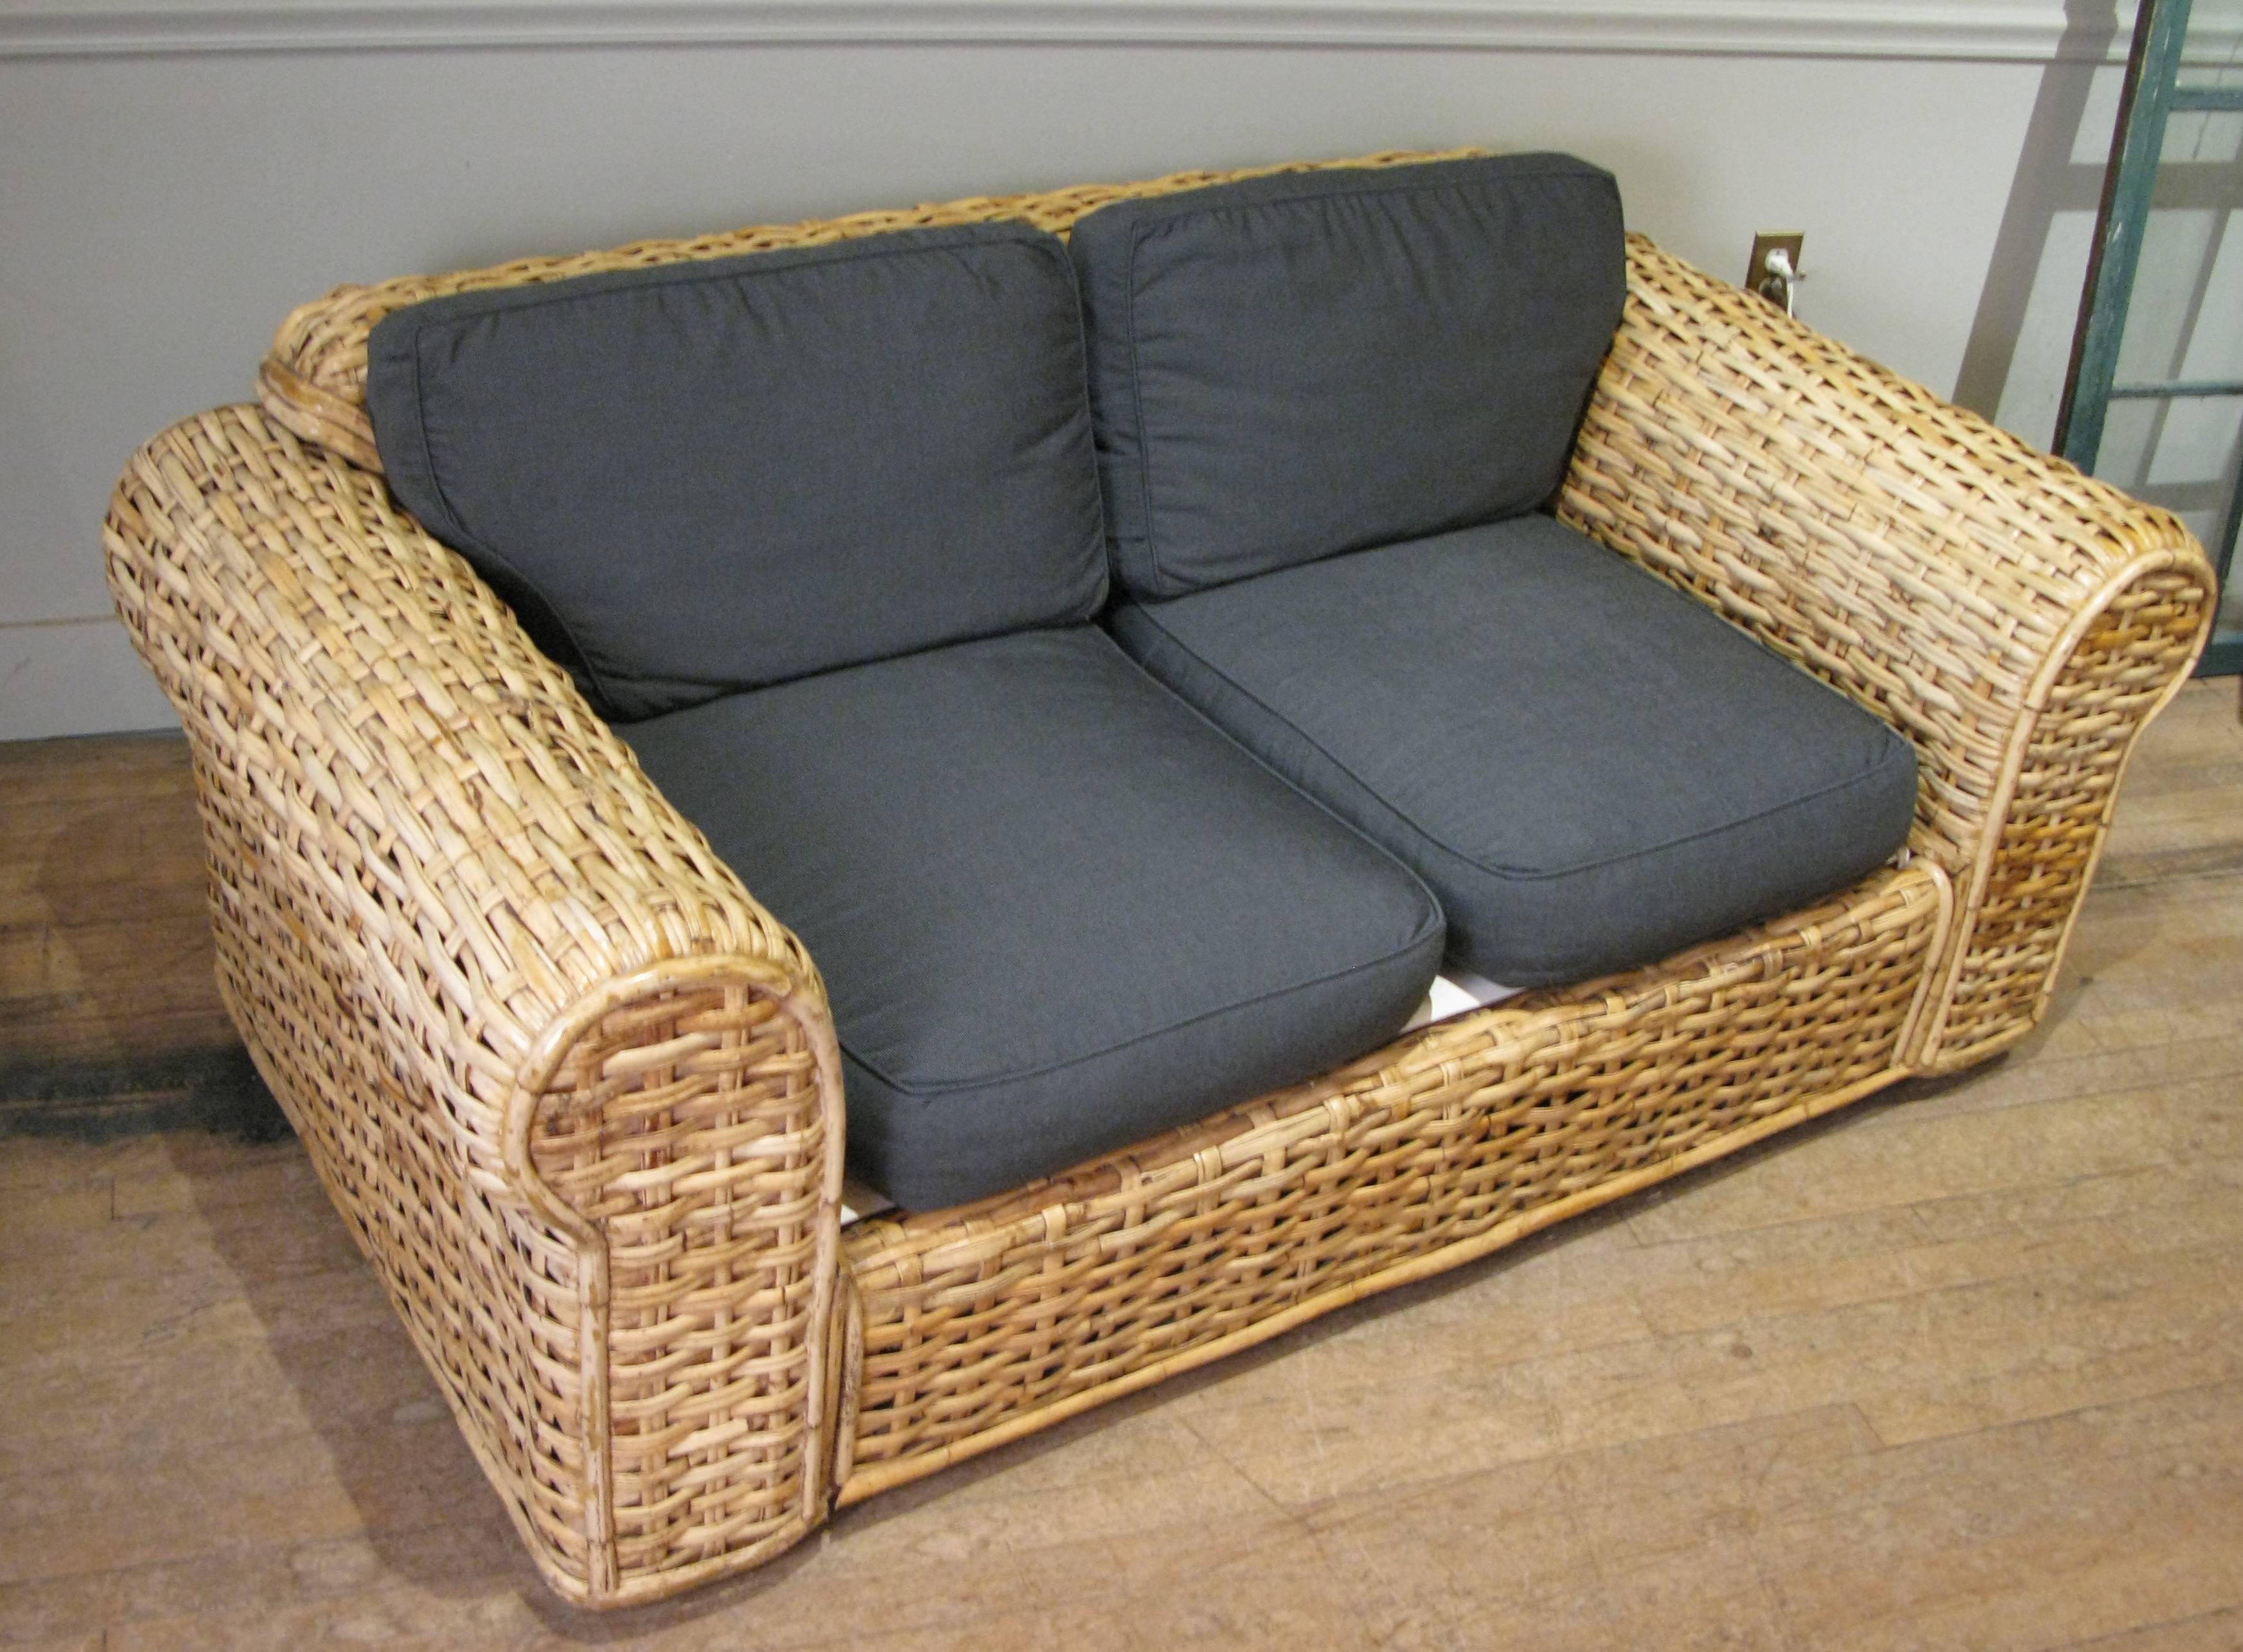 dux sofa by folke ohlsson recliner covers amazon woven rattan ralph lauren at 1stdibs